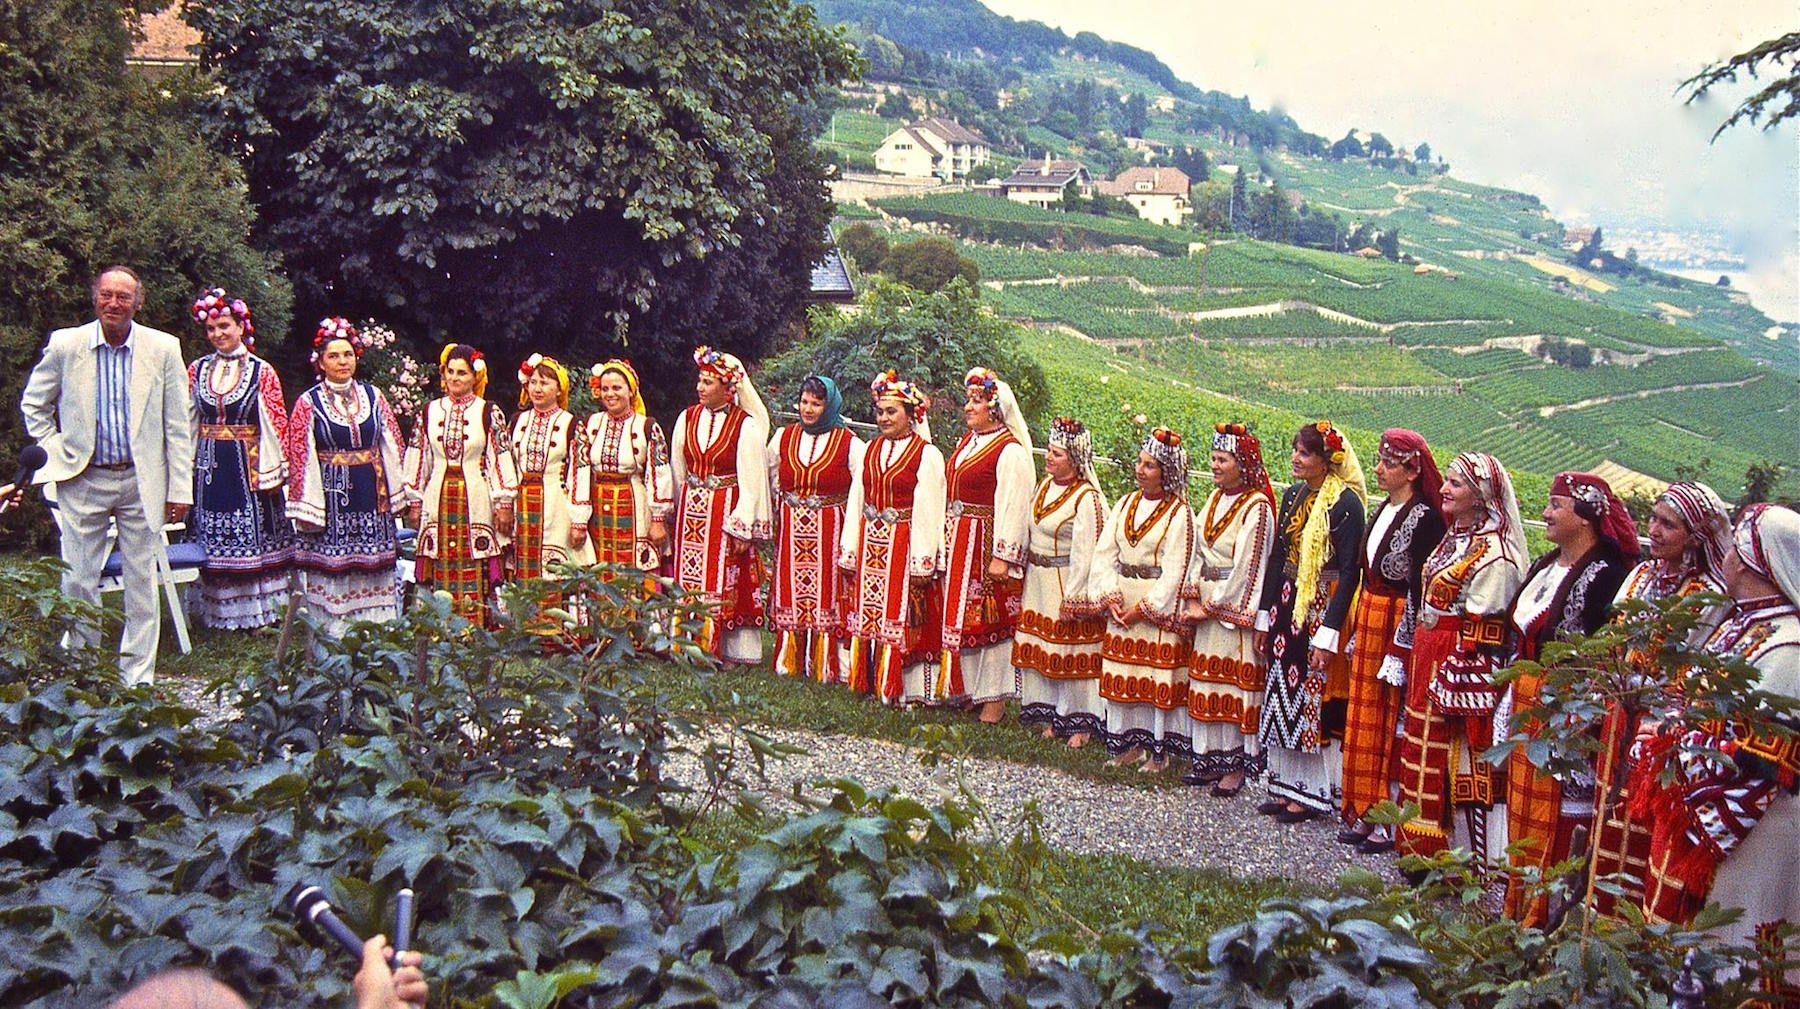 <em>Le Mystère Des Voix Bulgares</em>: How this all-female Bulgarian folk choir became a timeless cult phenomenon